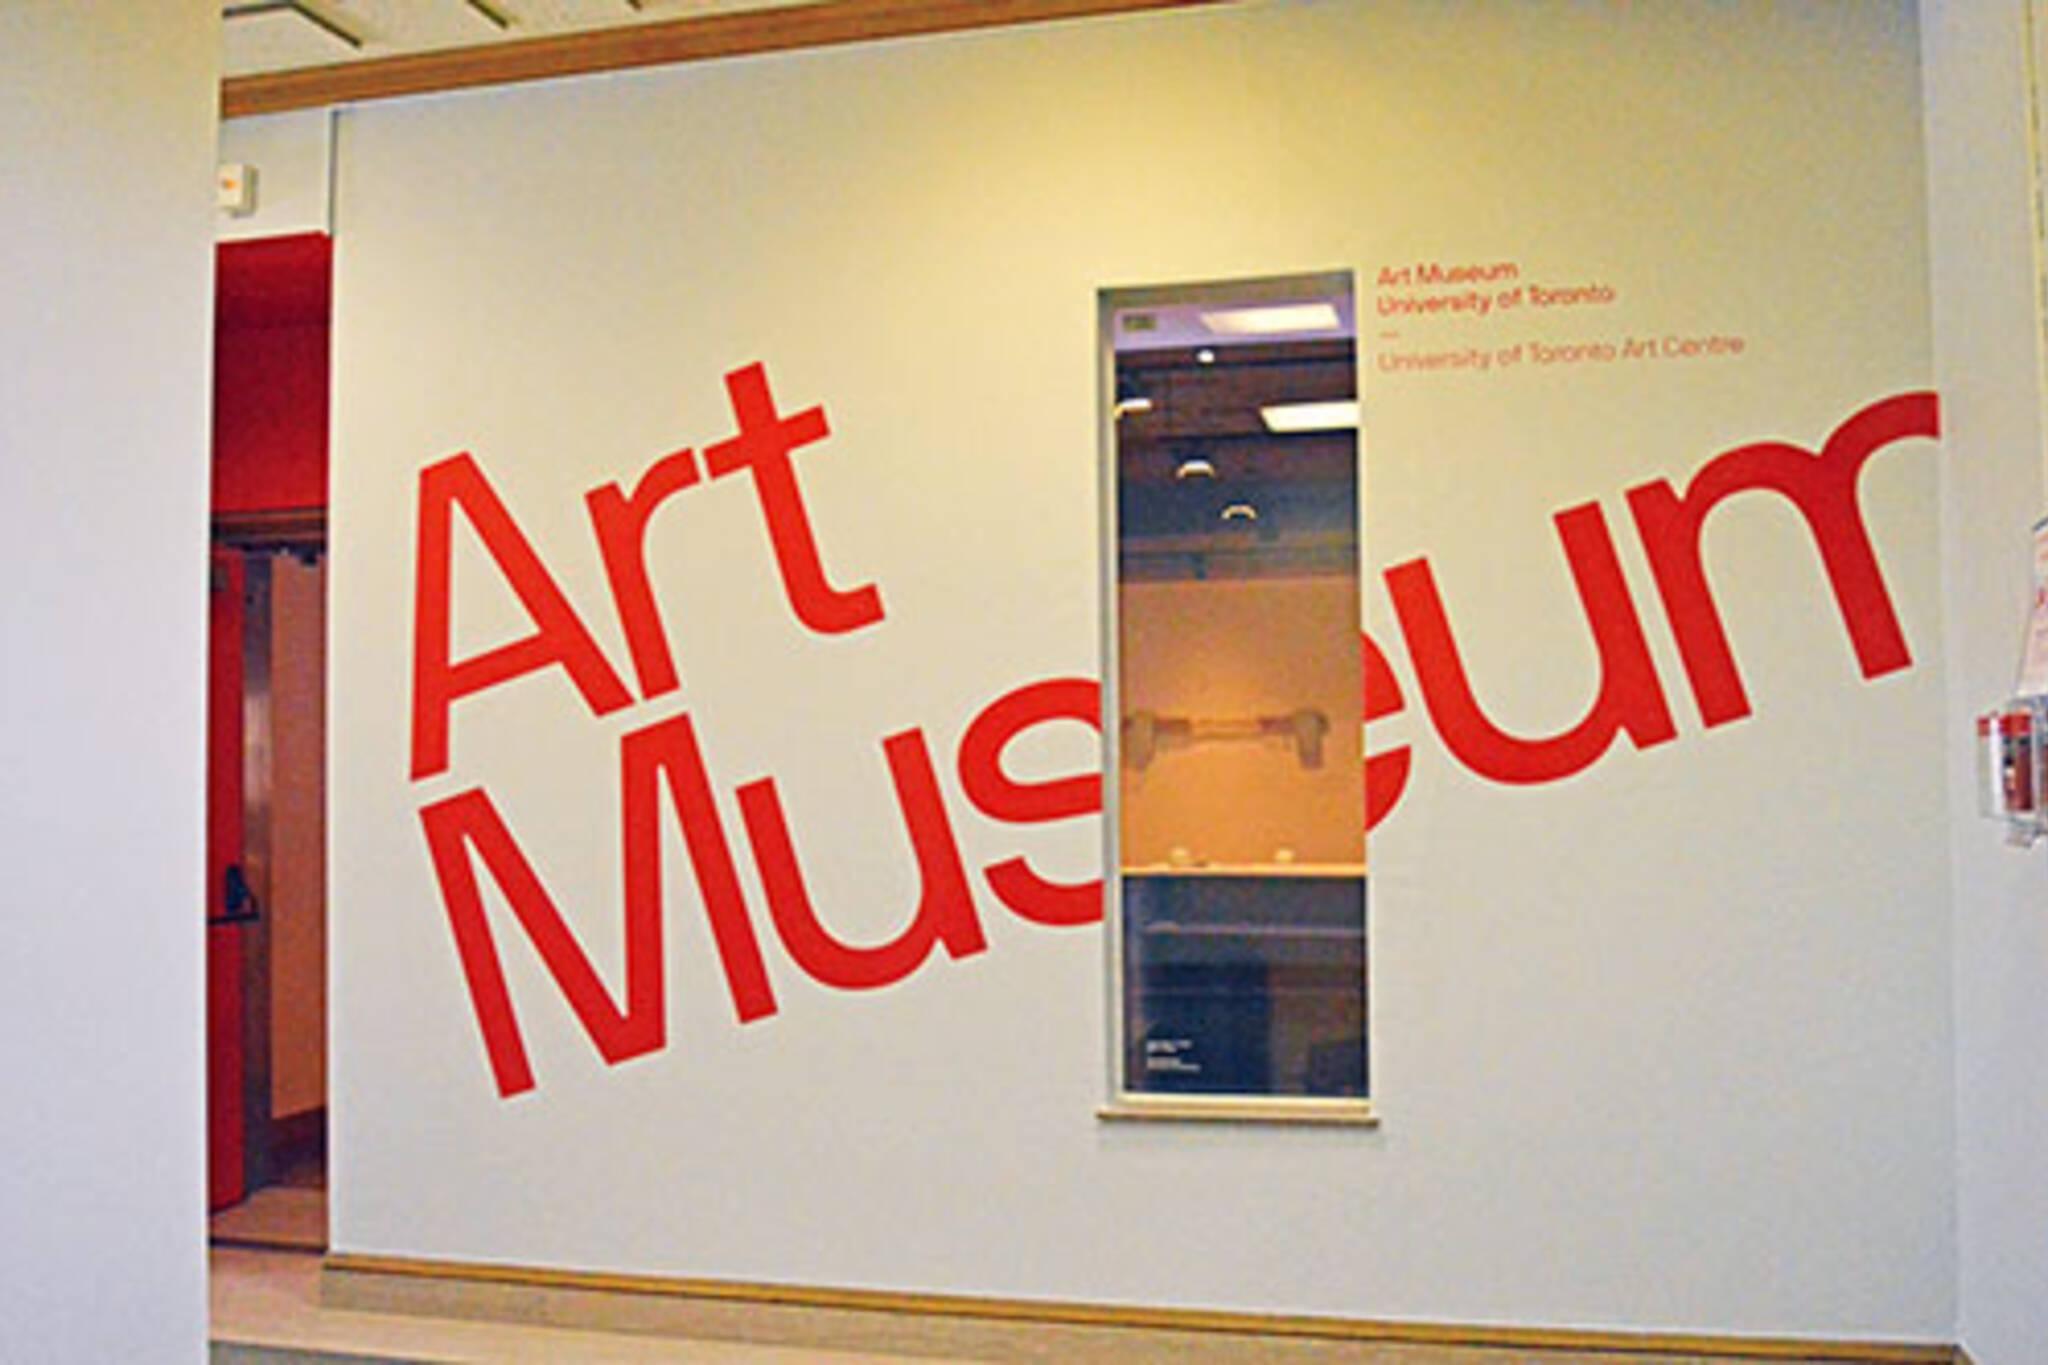 university of toronto art centre